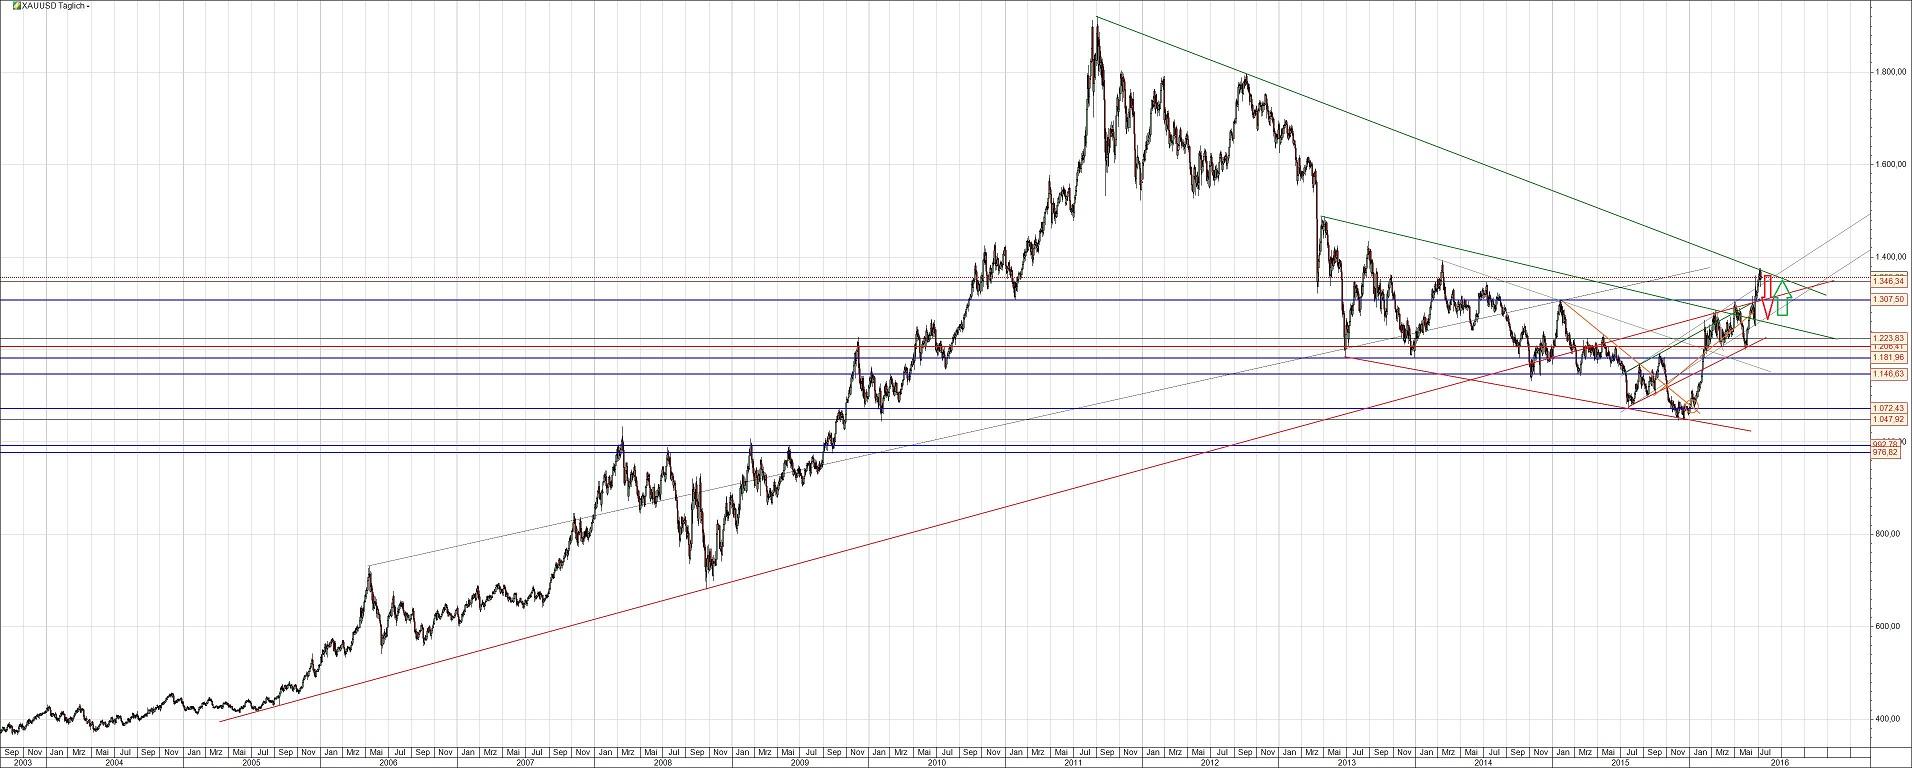 Goldpreis-Entwicklung langfristig